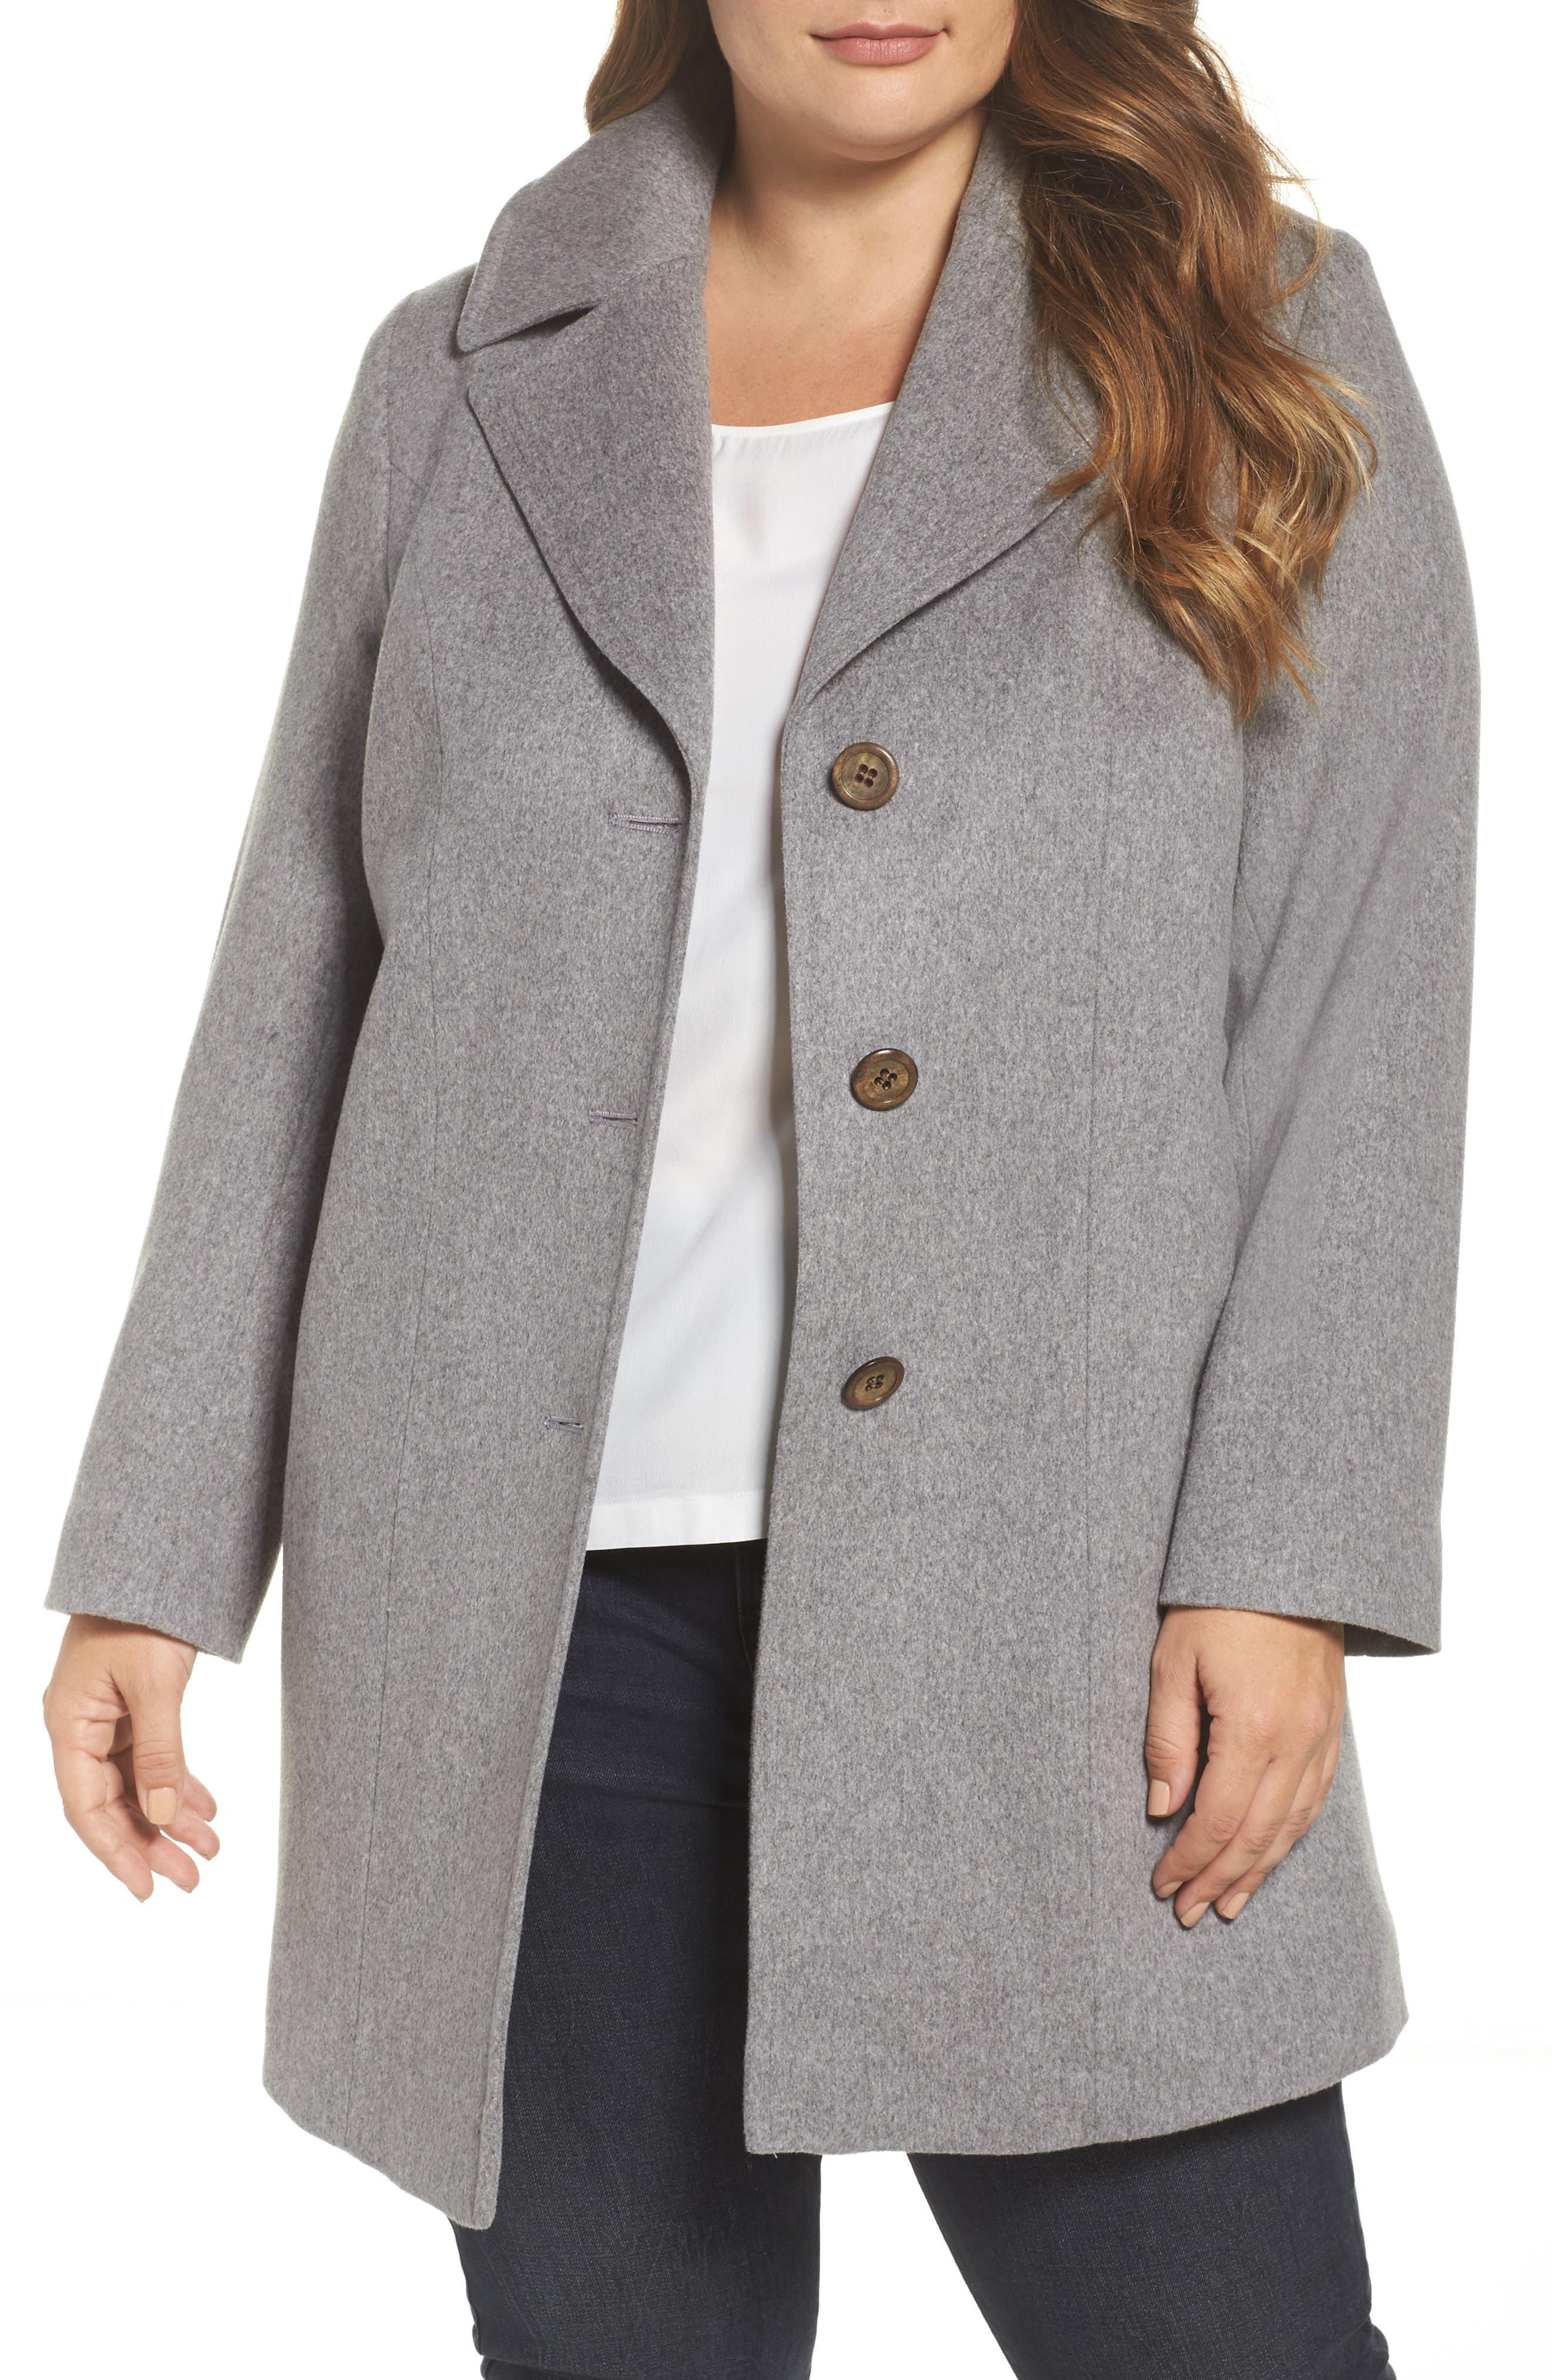 Alternate Image 1 Selected - Fleurette Wool Walking Coat (Plus Size)